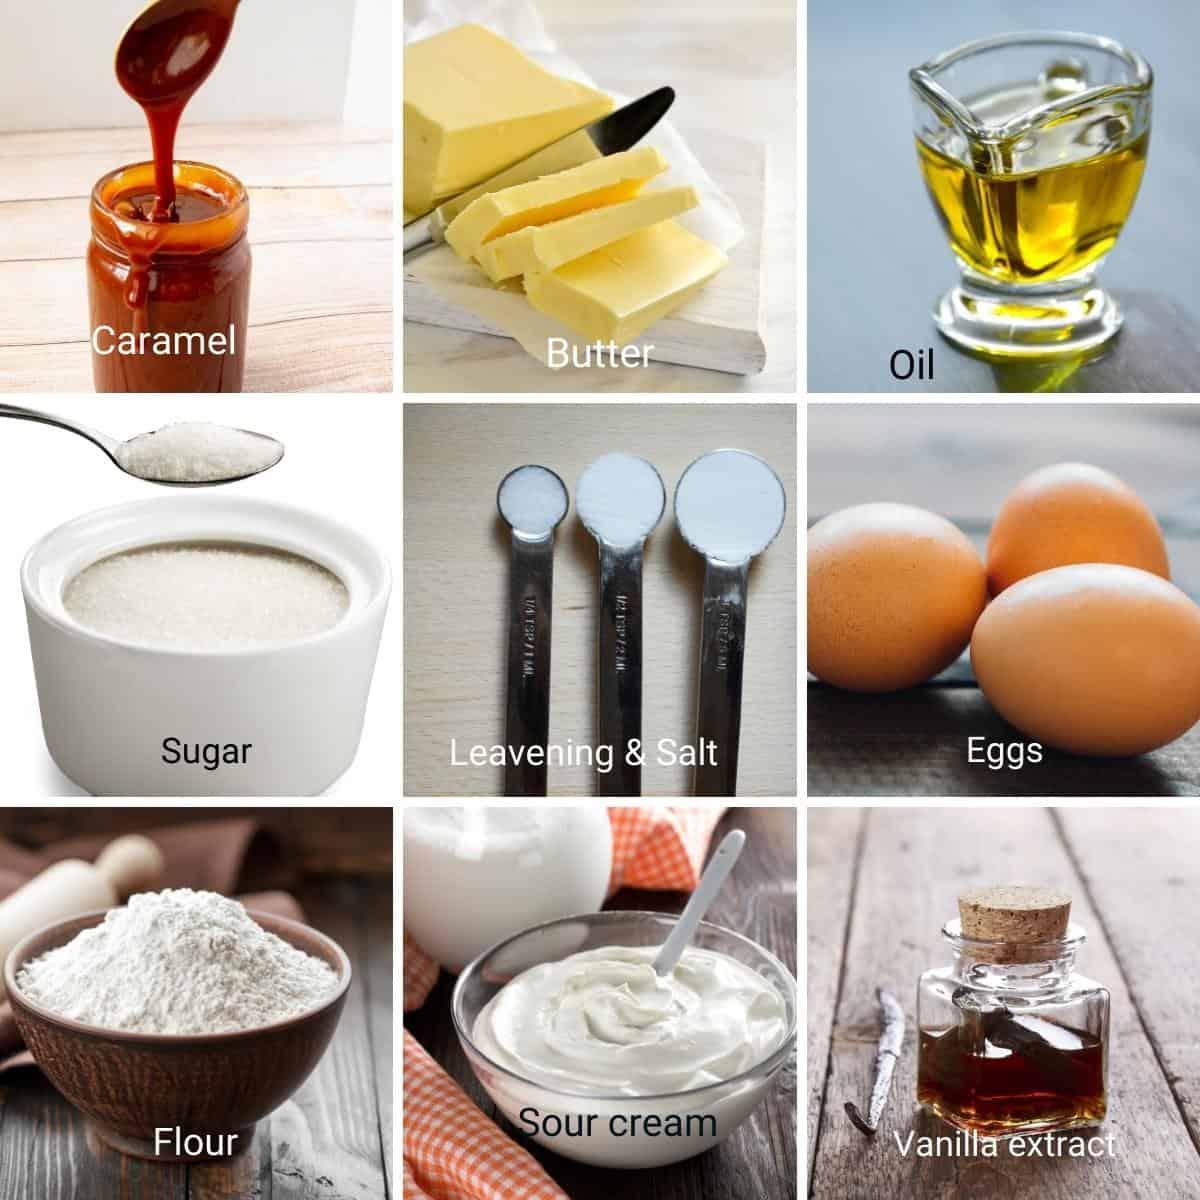 Ingredients for alphabet cake recipe.